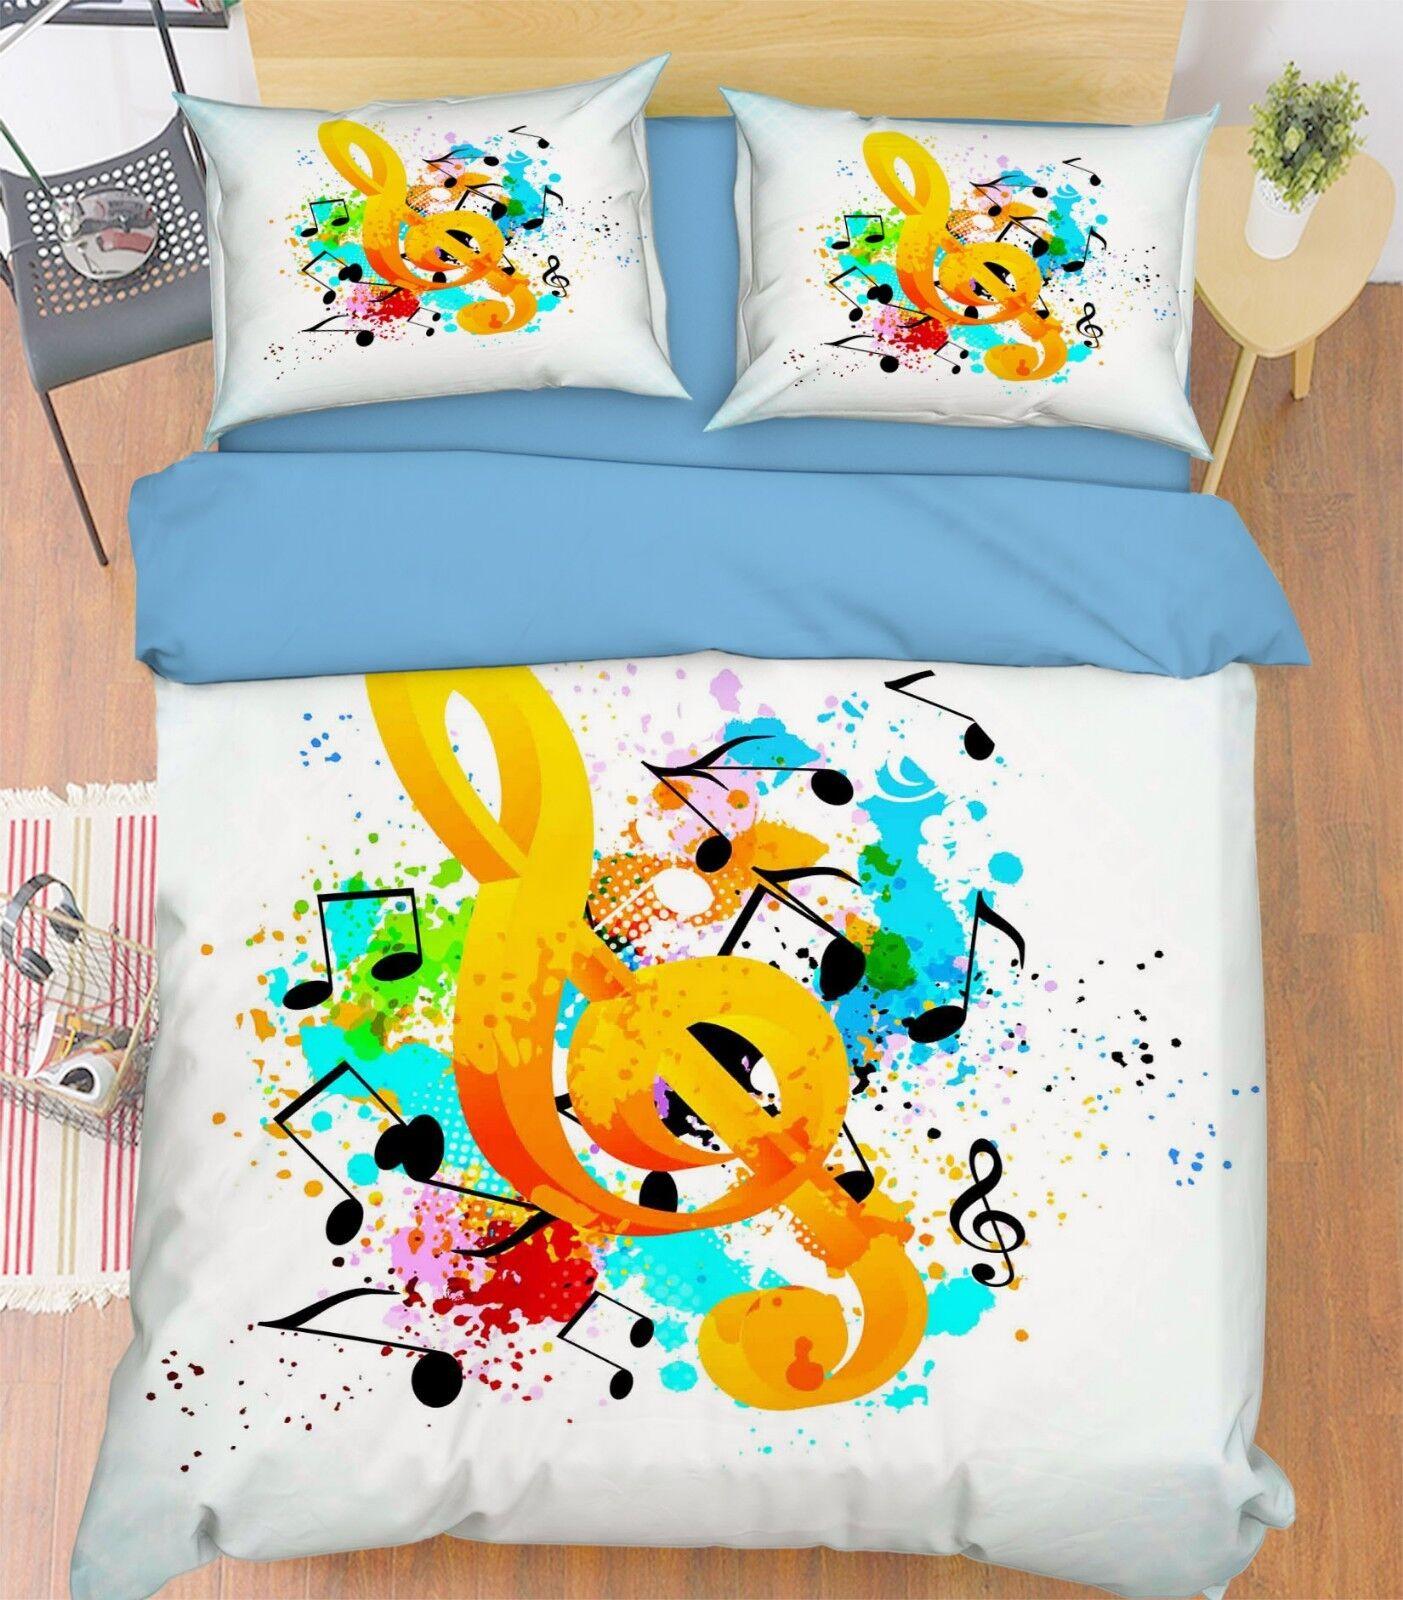 3D Musical Notes 5 Bed Pillowcases Quilt Duvet Cover Set Single King UK Summer